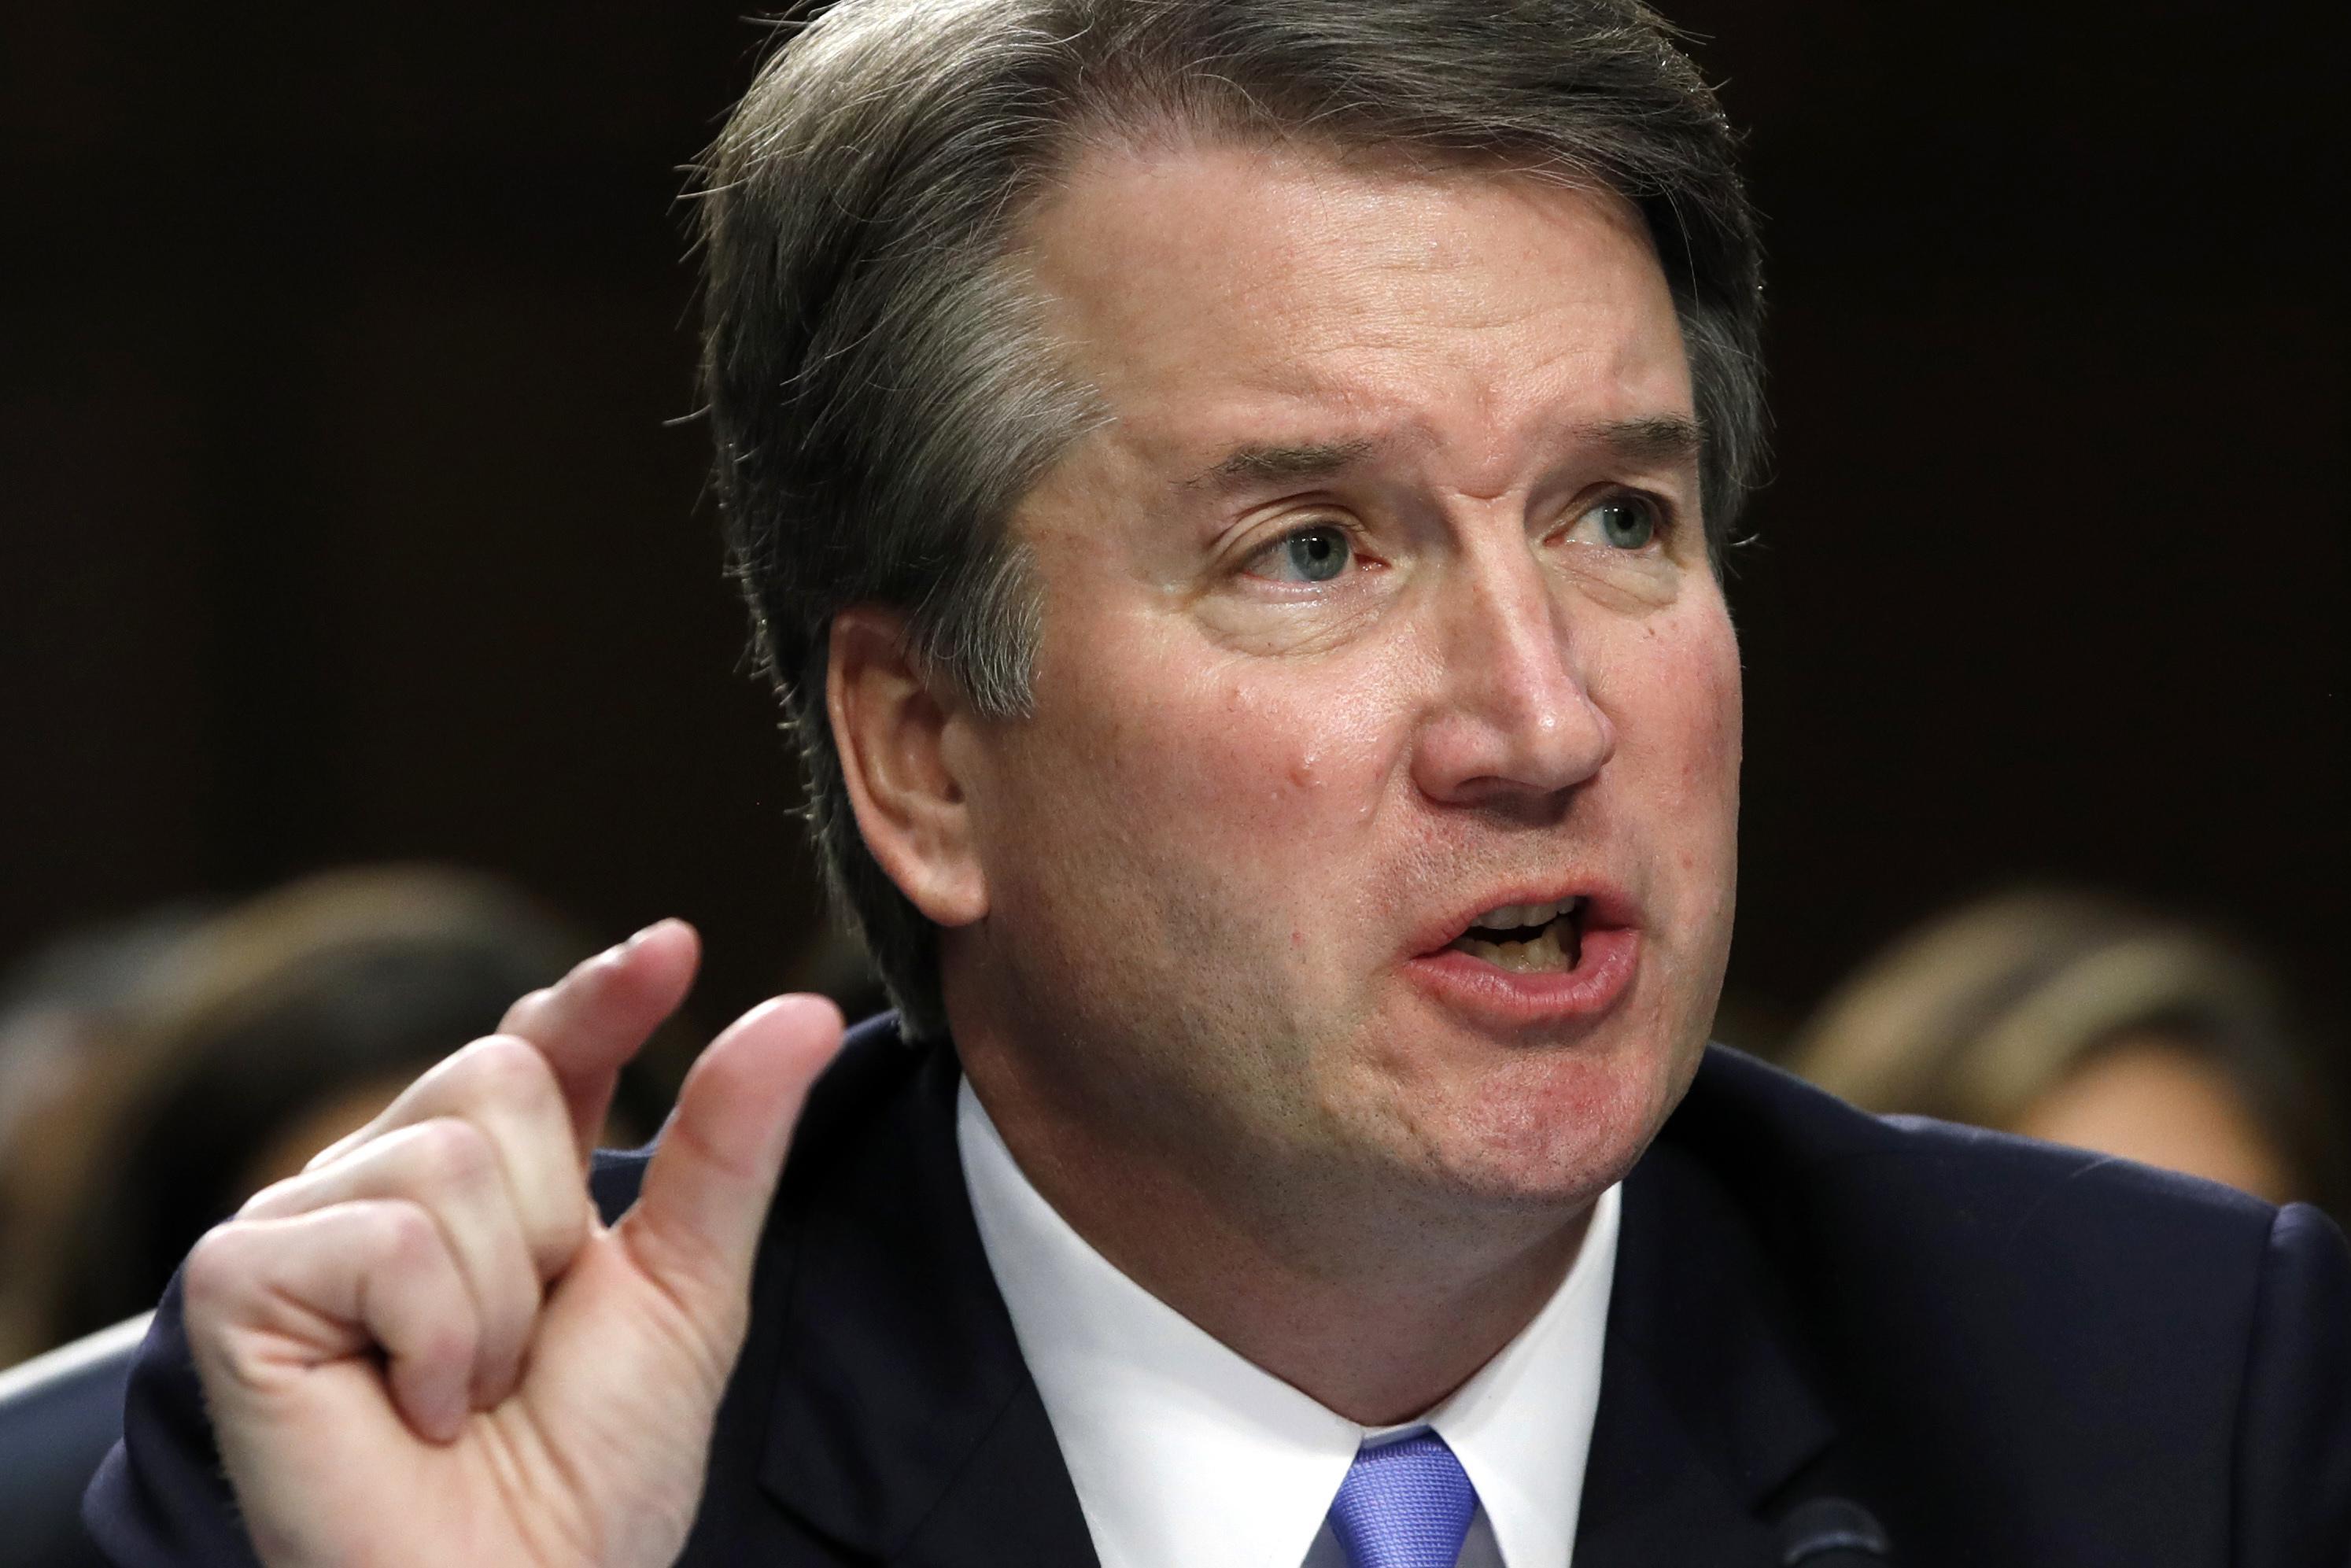 Senators push for prosecution of Justice Kavanaugh accusers